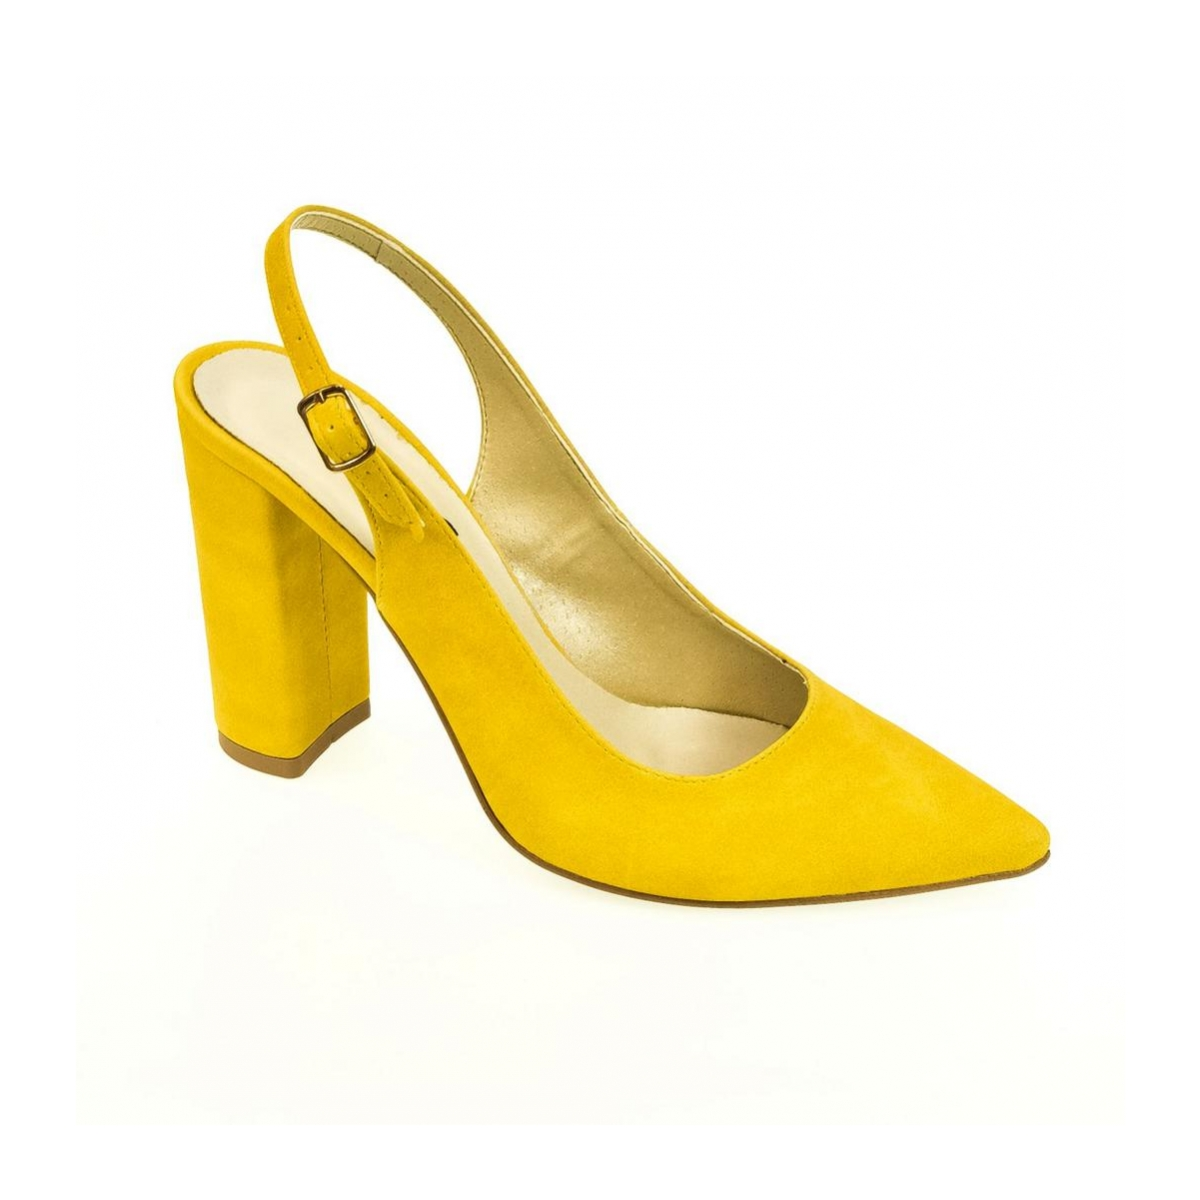 e77fa6cd6d Dámske žlté sandále ELISSA - 4